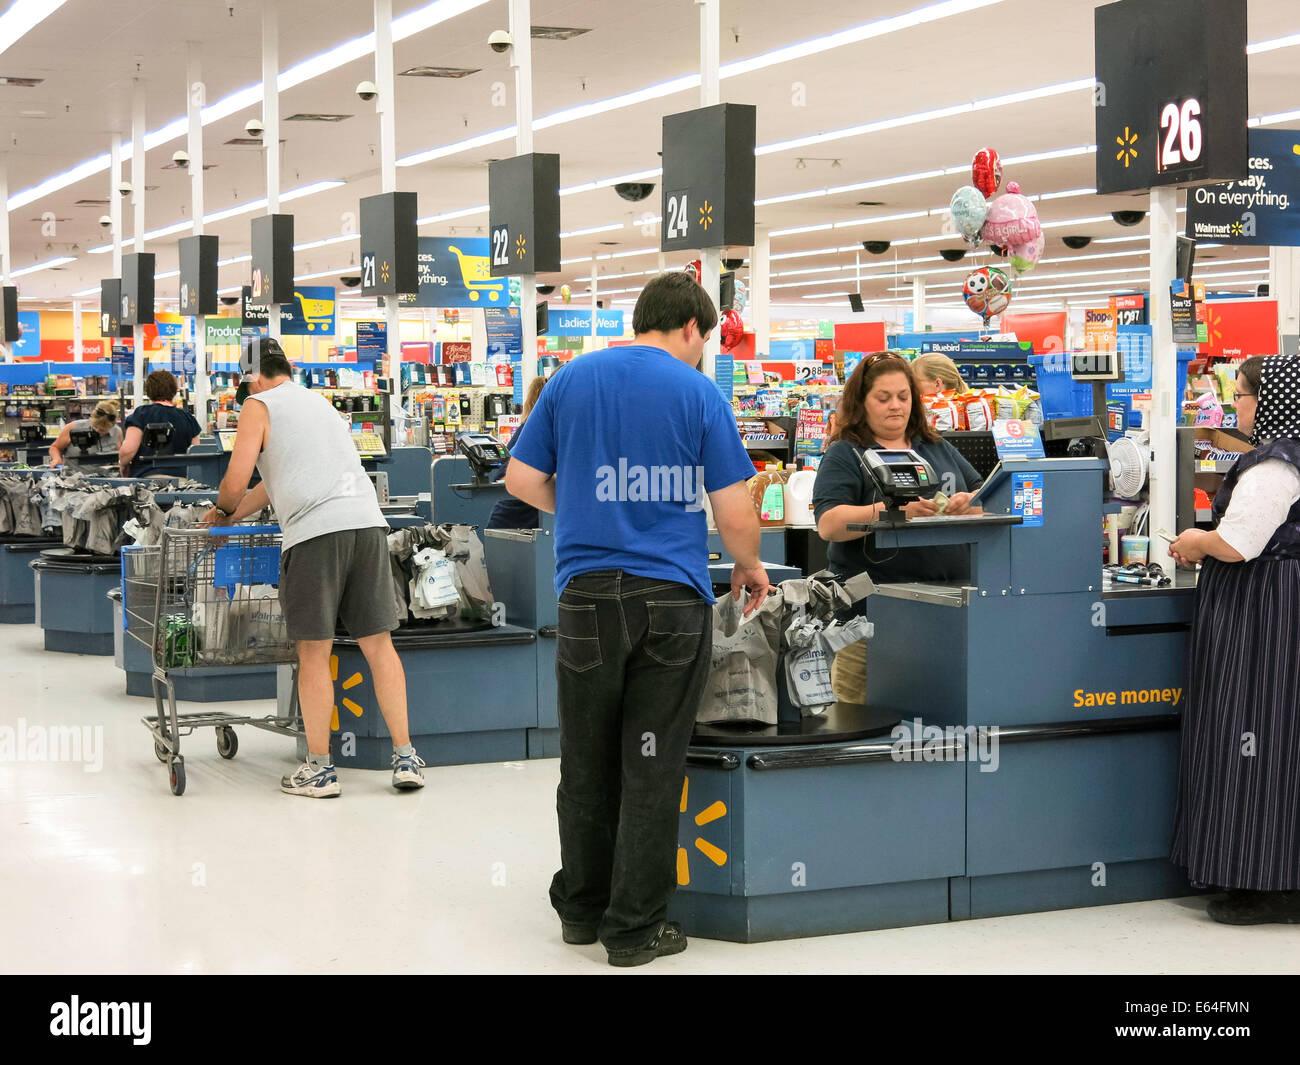 Check Walmart Store Stock